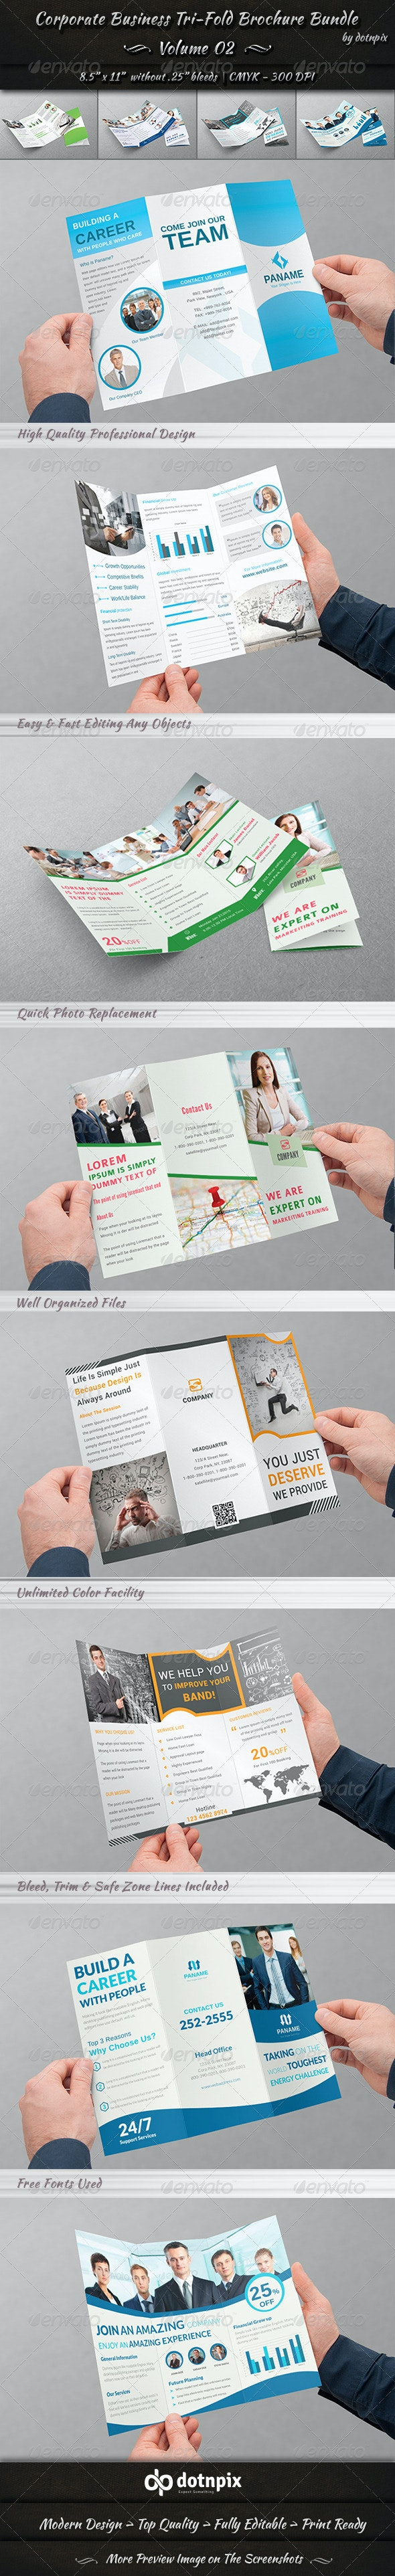 Corporate Business Tri-Fold Brochure Bundle | v2 - Corporate Brochures